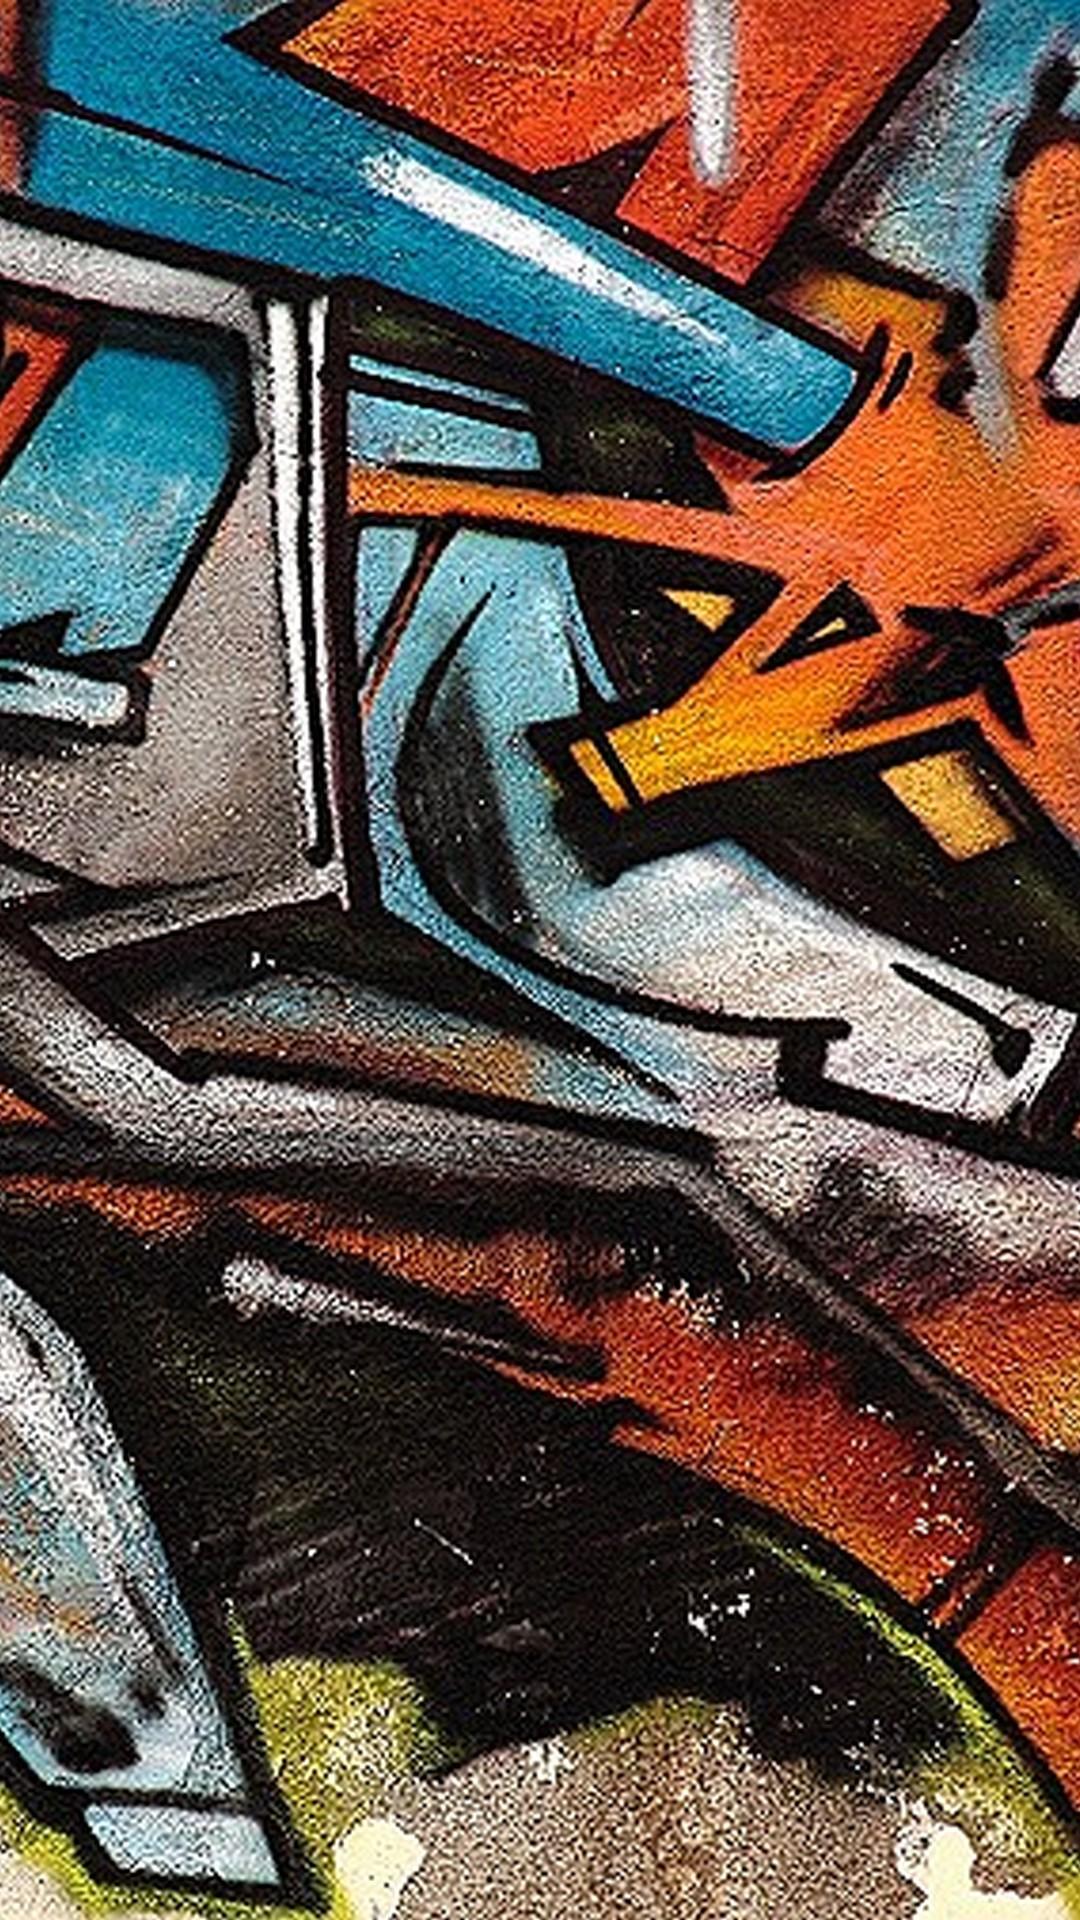 HD Graffiti Font Wall Art